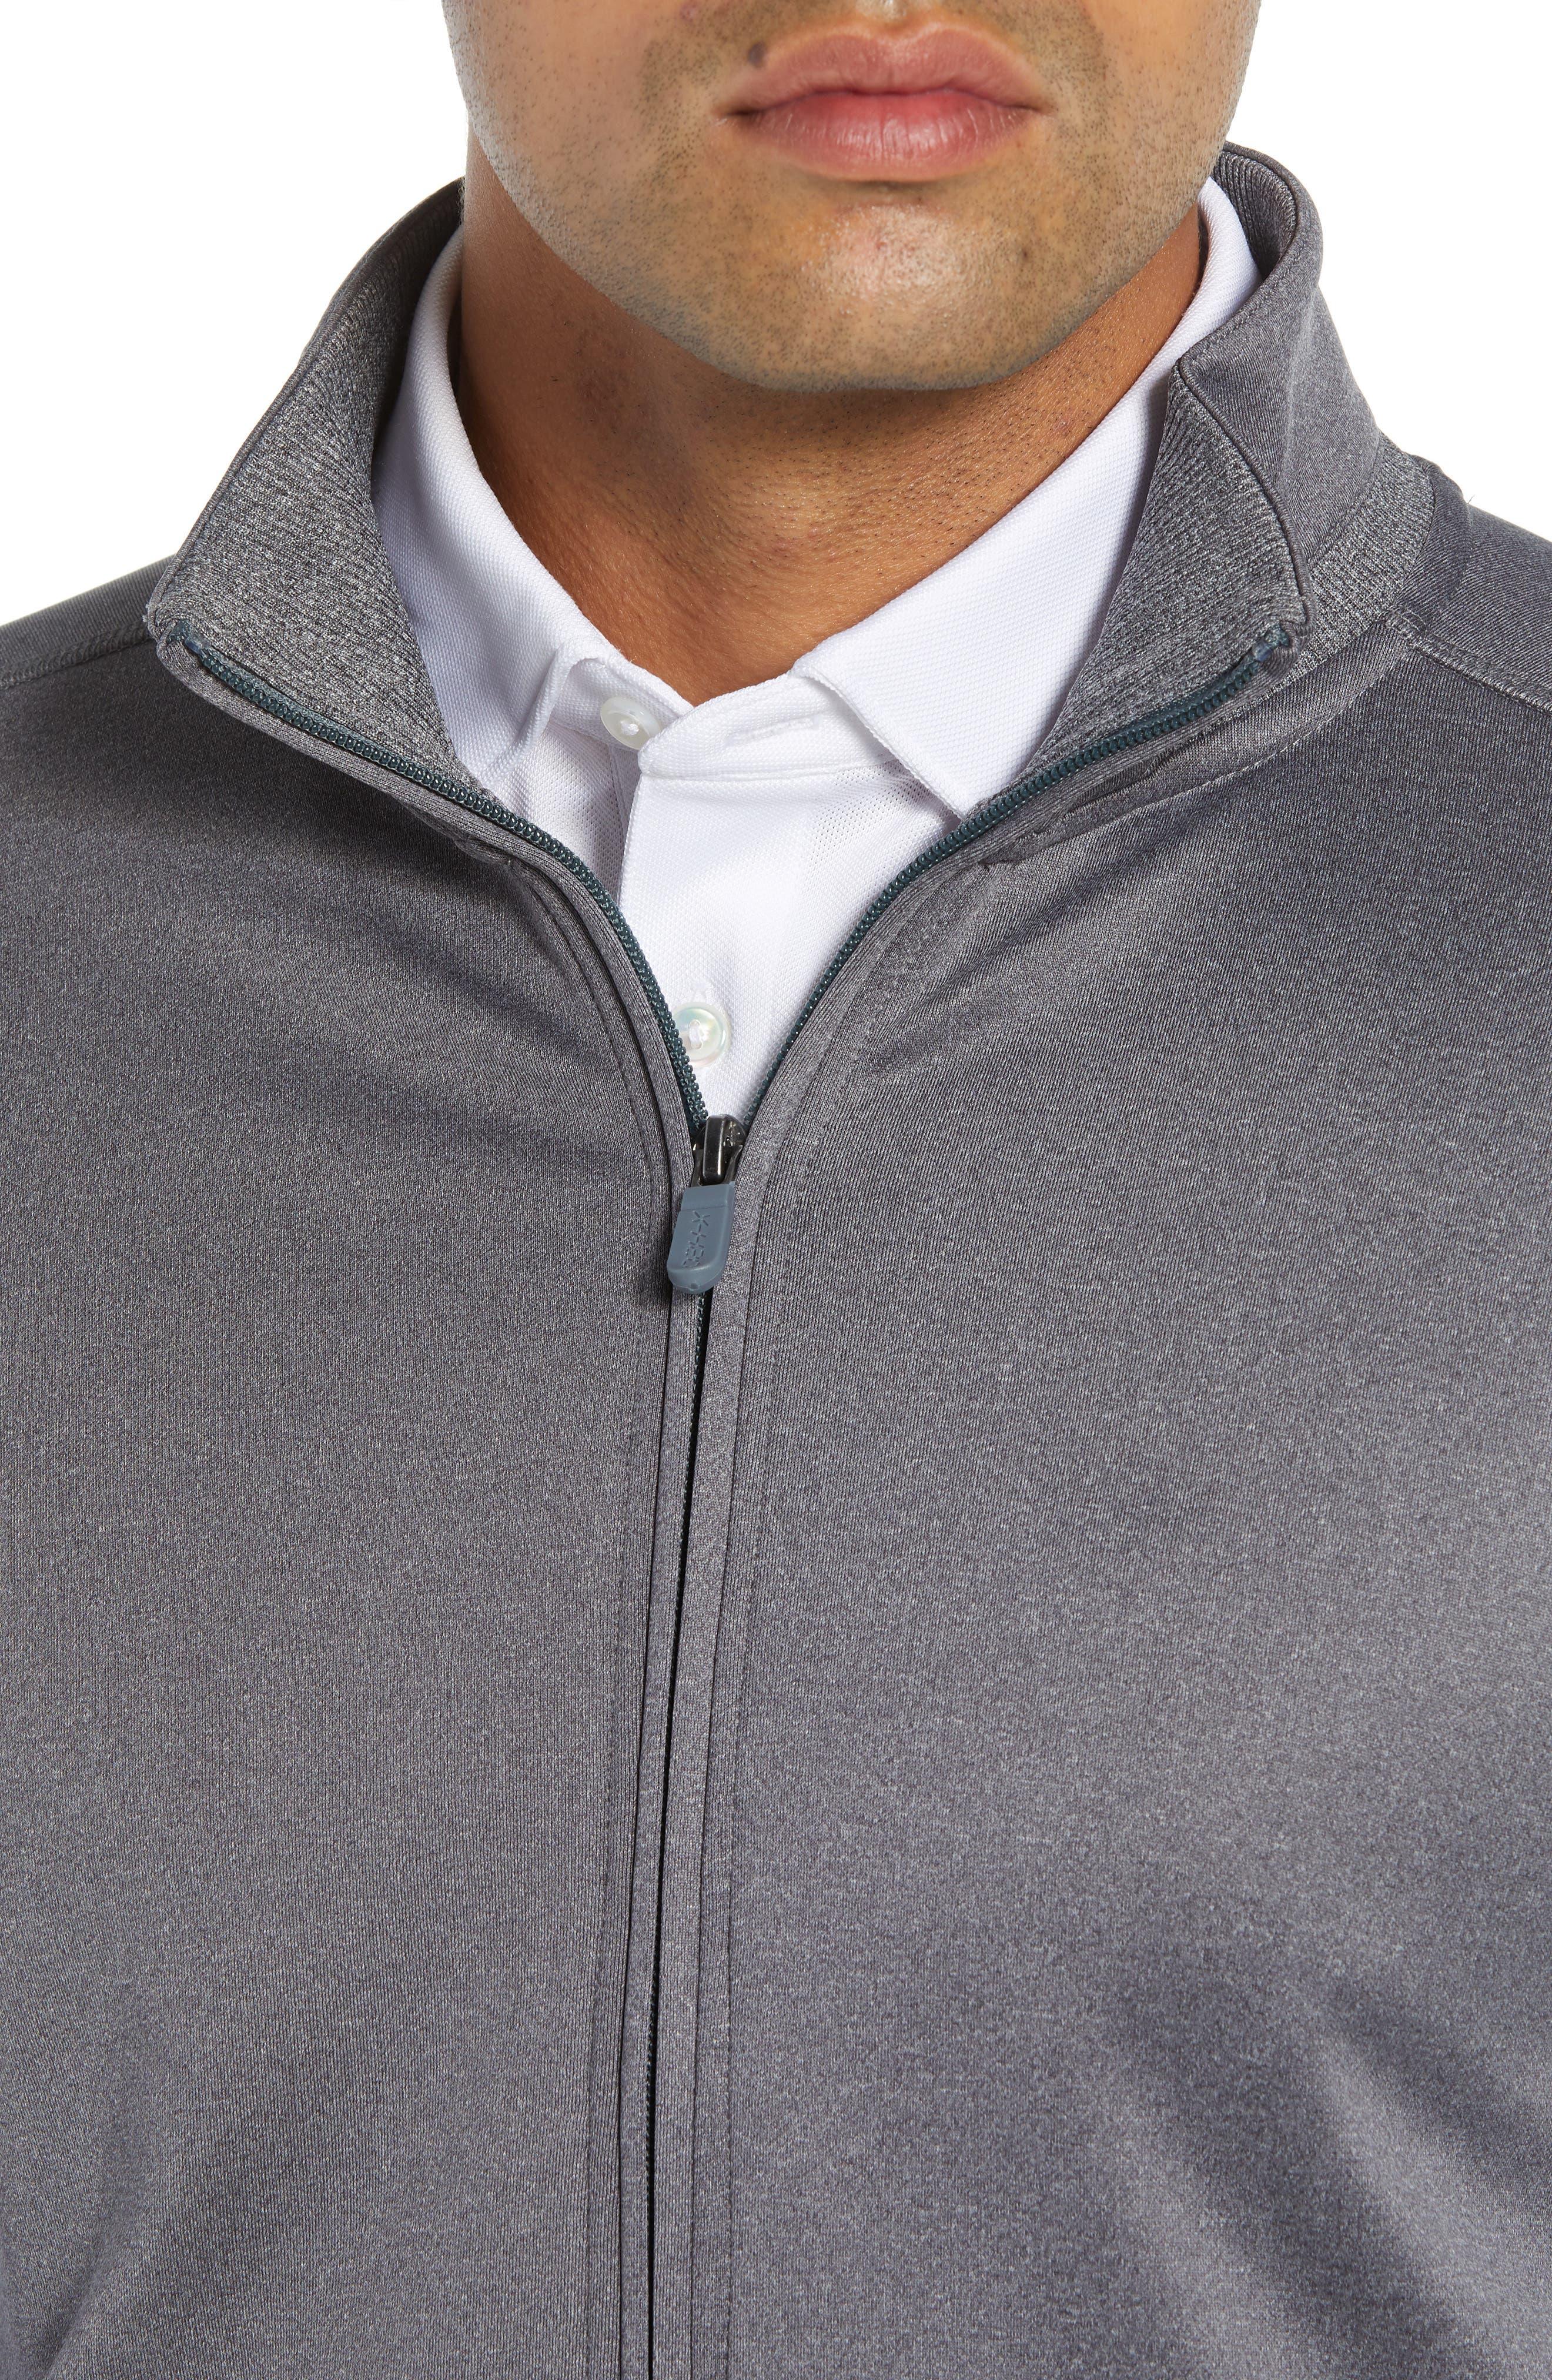 XH20 Denali Performance Jacket,                             Alternate thumbnail 4, color,                             GRAPHITE